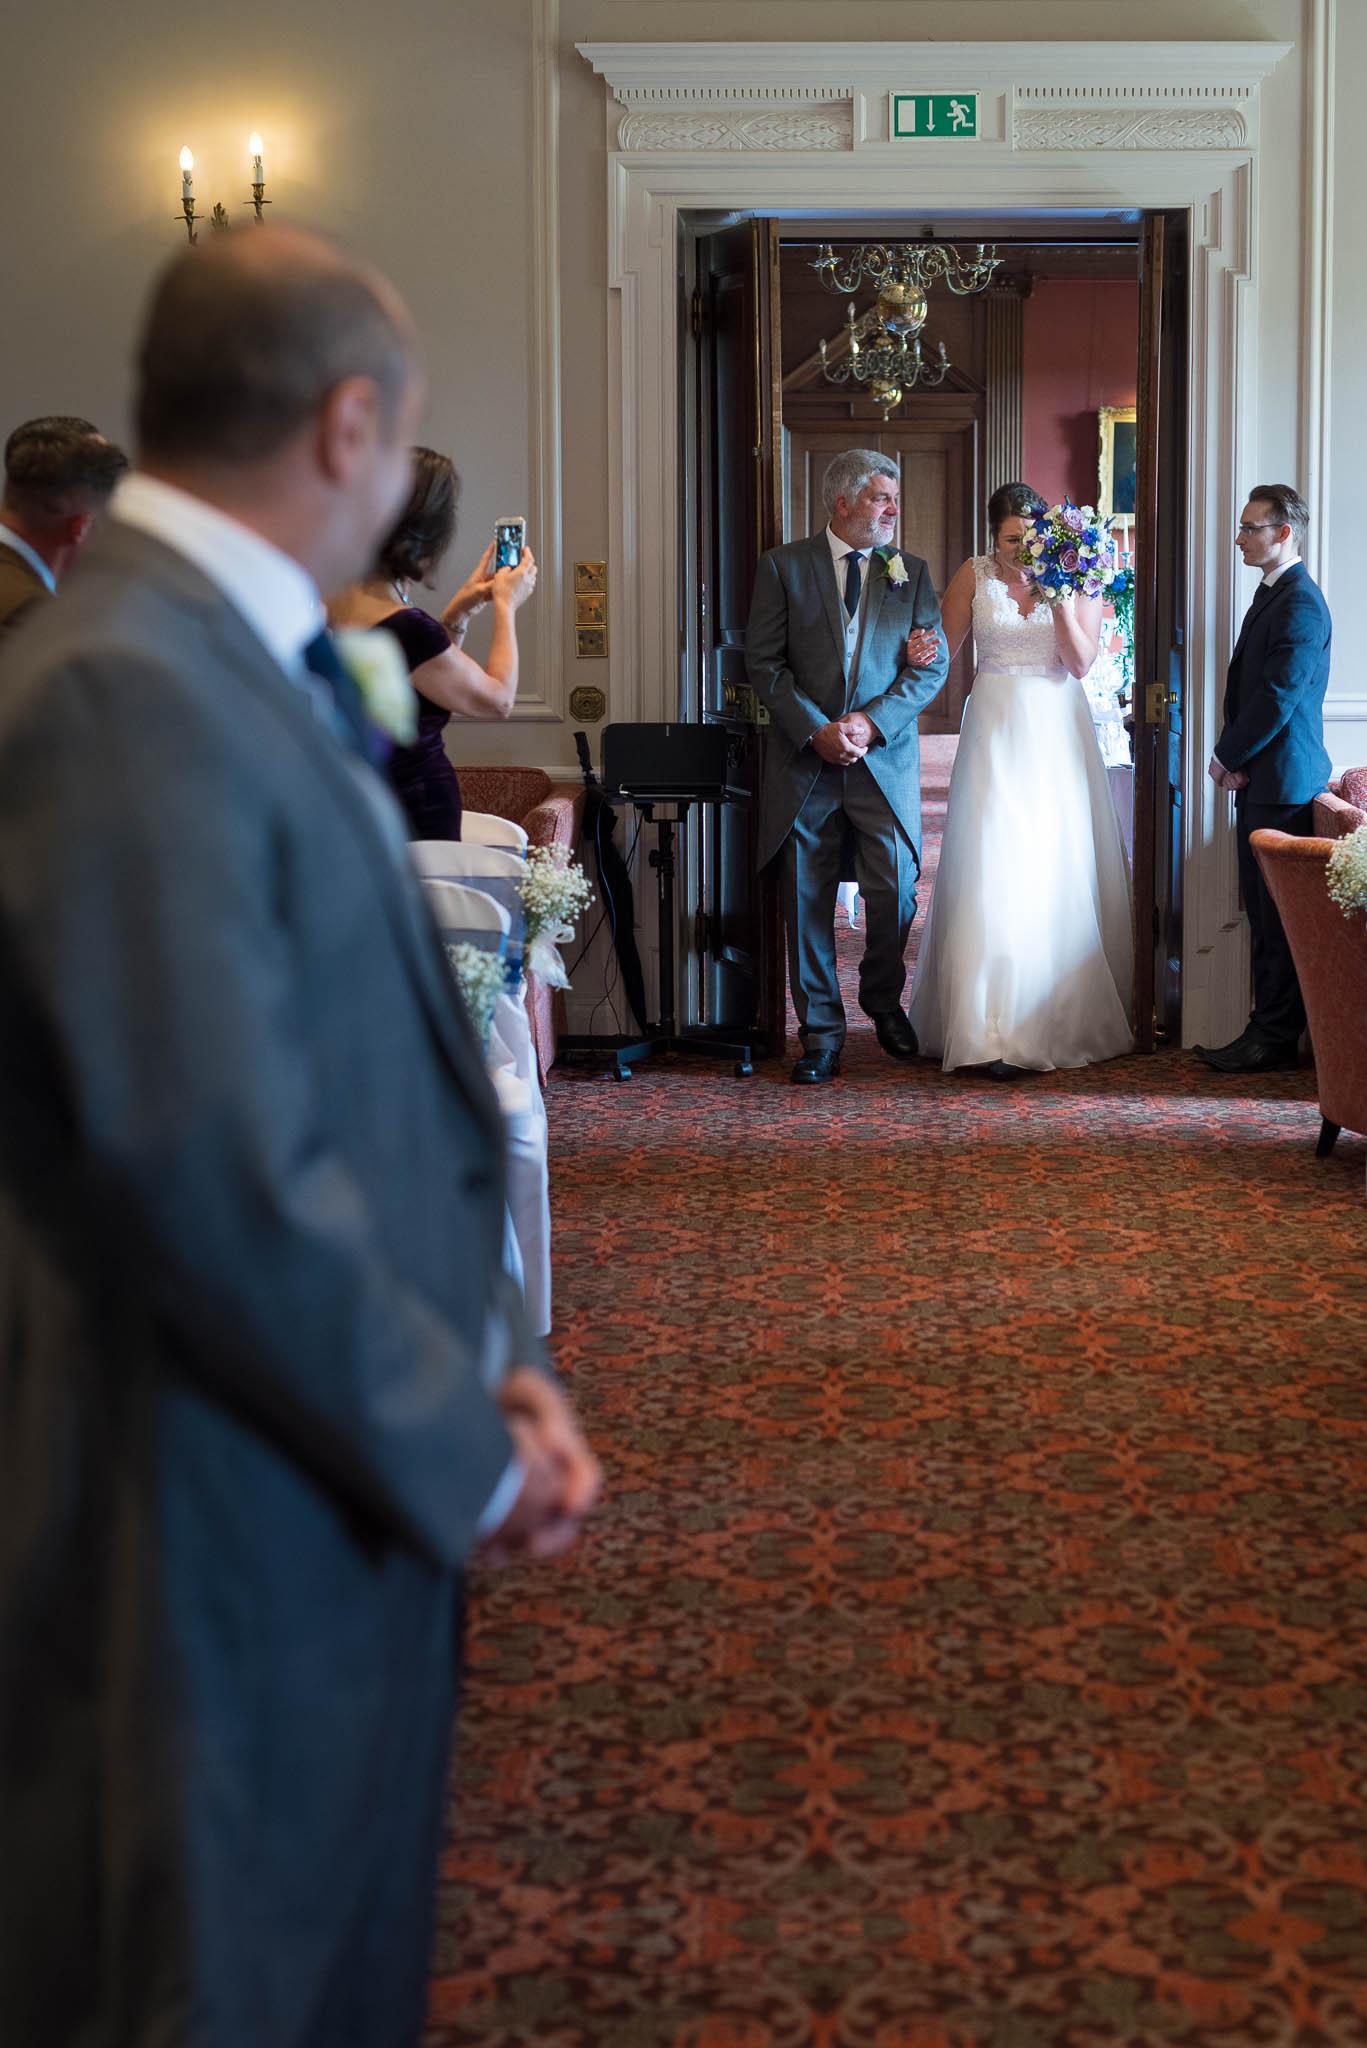 Crathorne Hall Hotel Wedding Photographer51.jpg